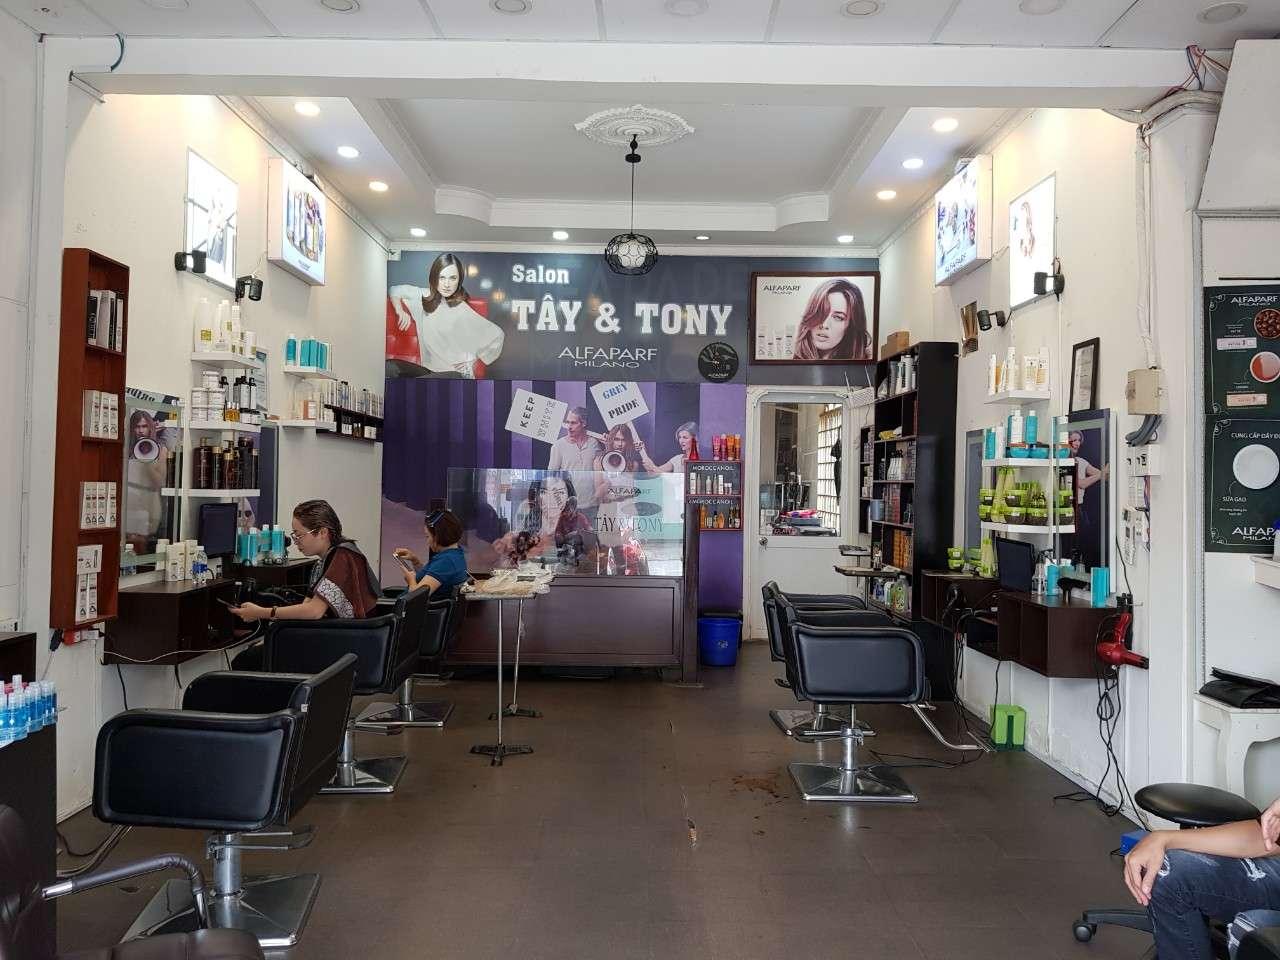 Hair Salon Tây & Tony